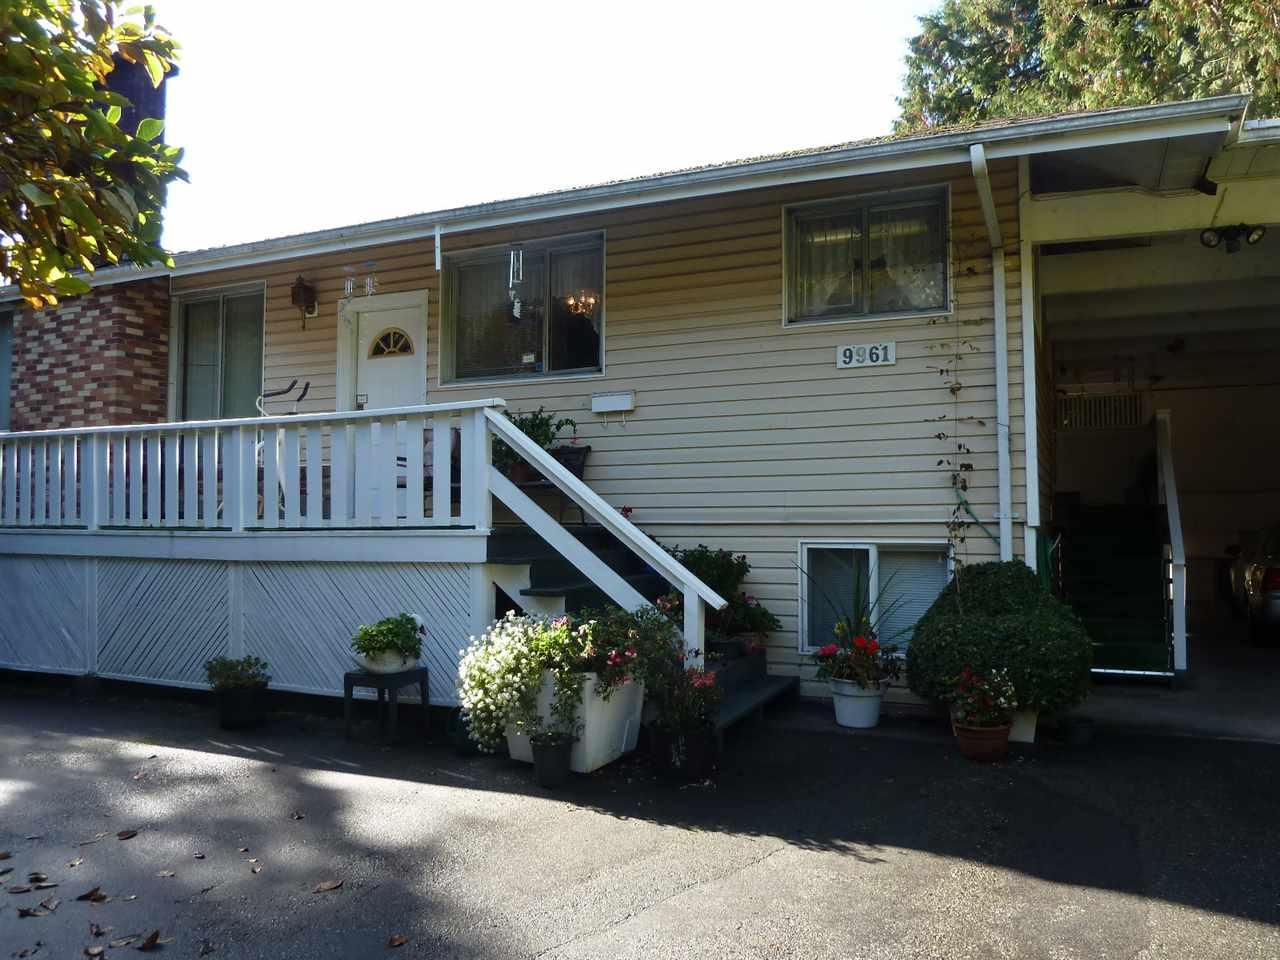 9961 140 STREET, Surrey, BC, V3T 4M4 Photo 1